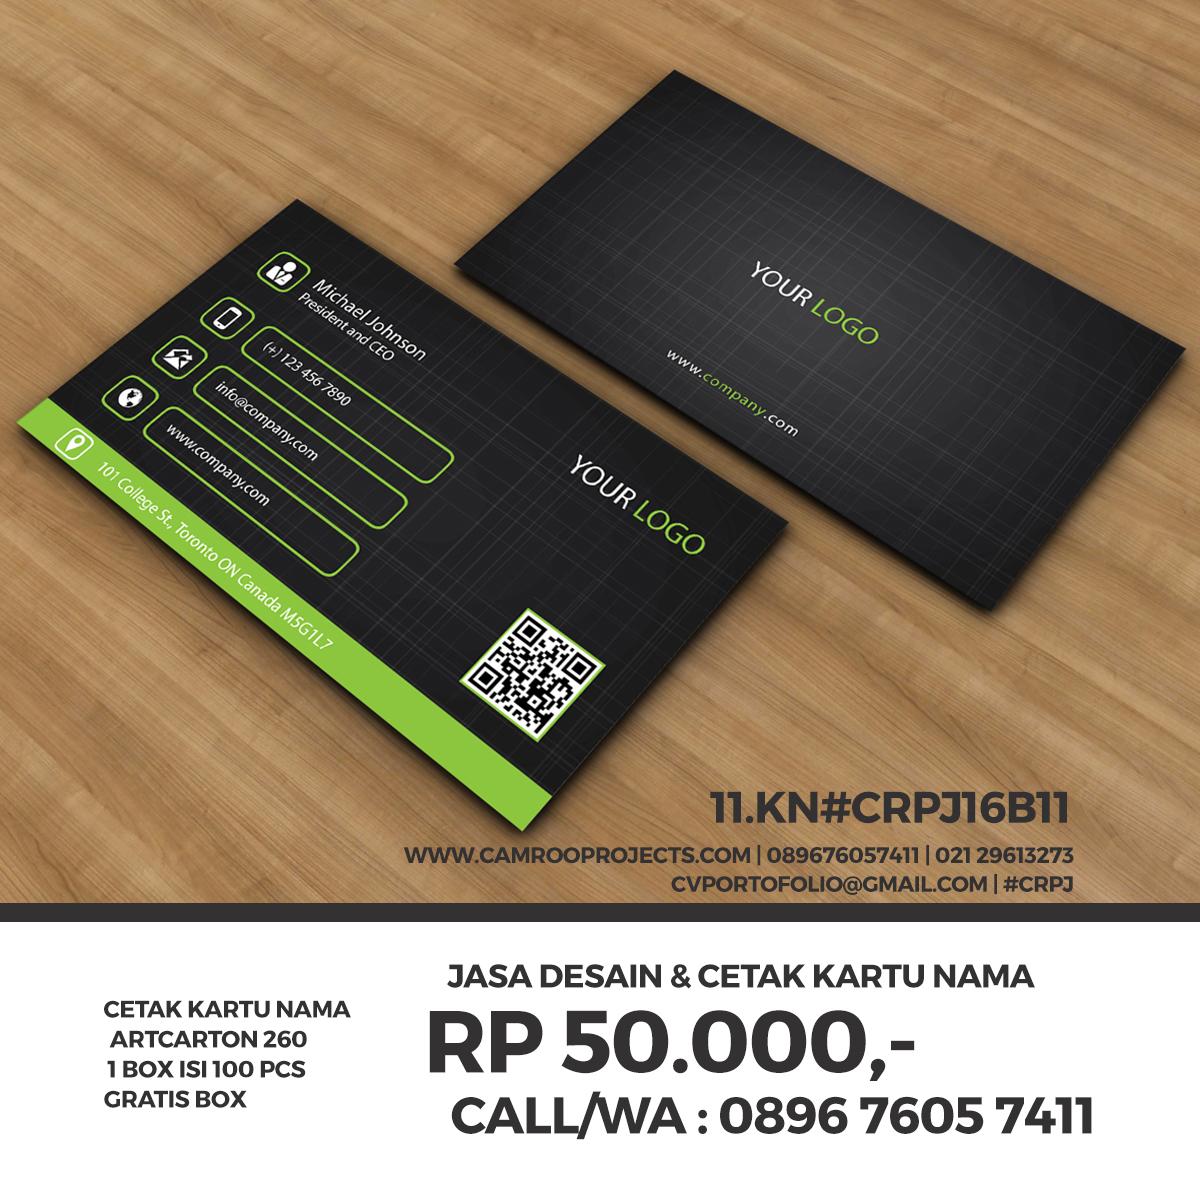 Jasa Desain Kartu Nama | Terunik | Call/WA 0896 760 574 11